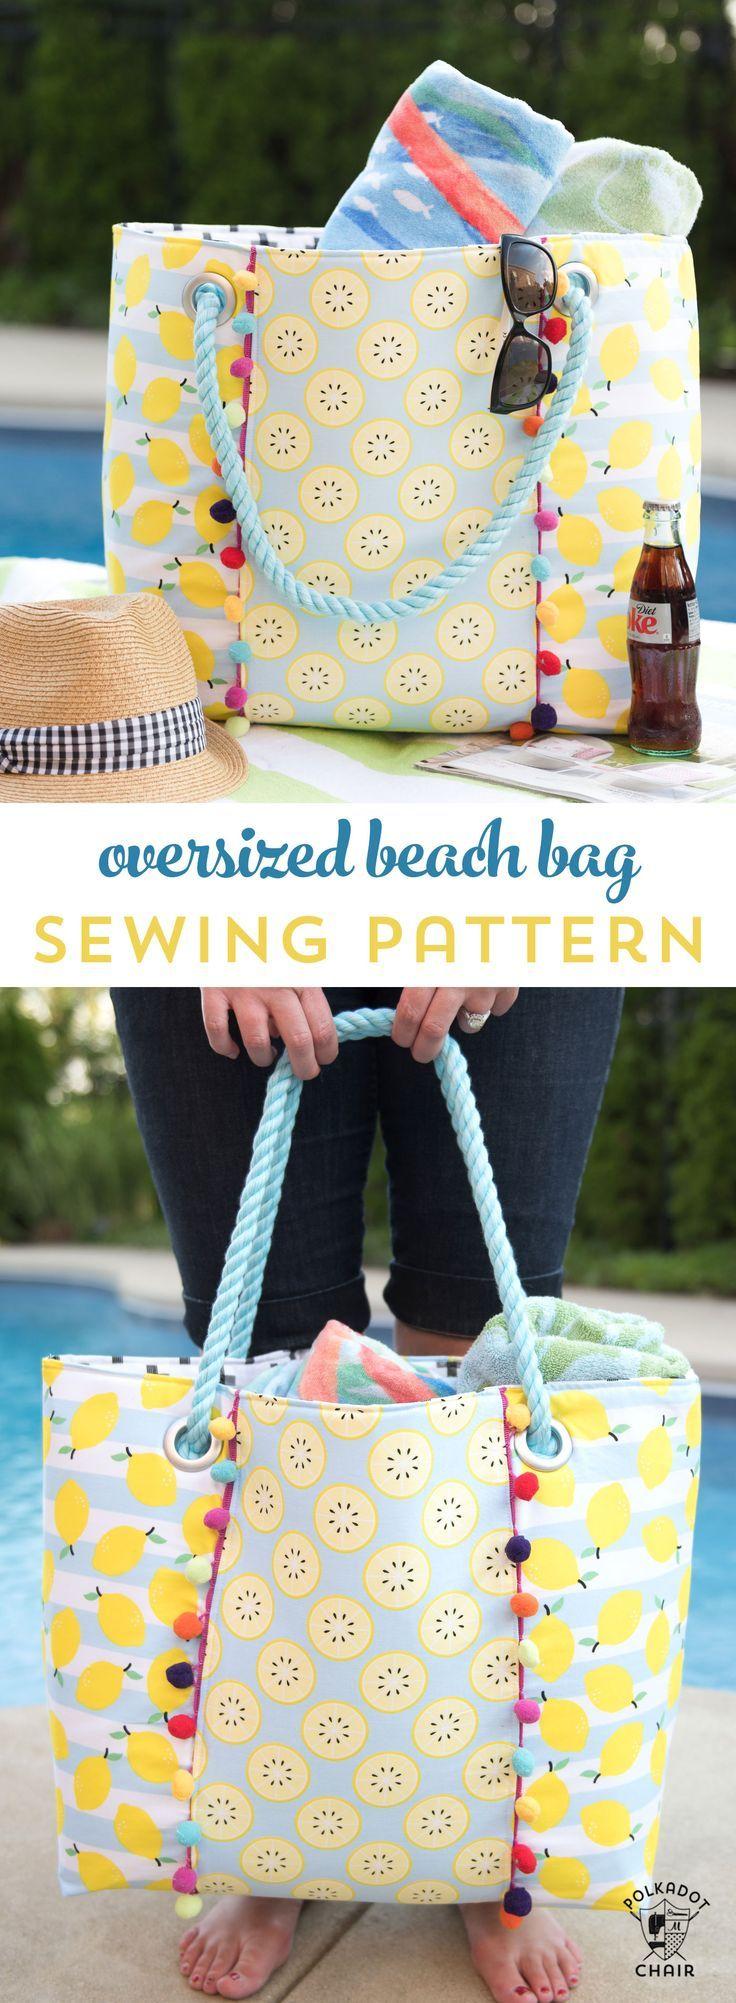 Oversized Beach Bag Sewing Pattern - Page 2 of 2 | Taschen nähen ...